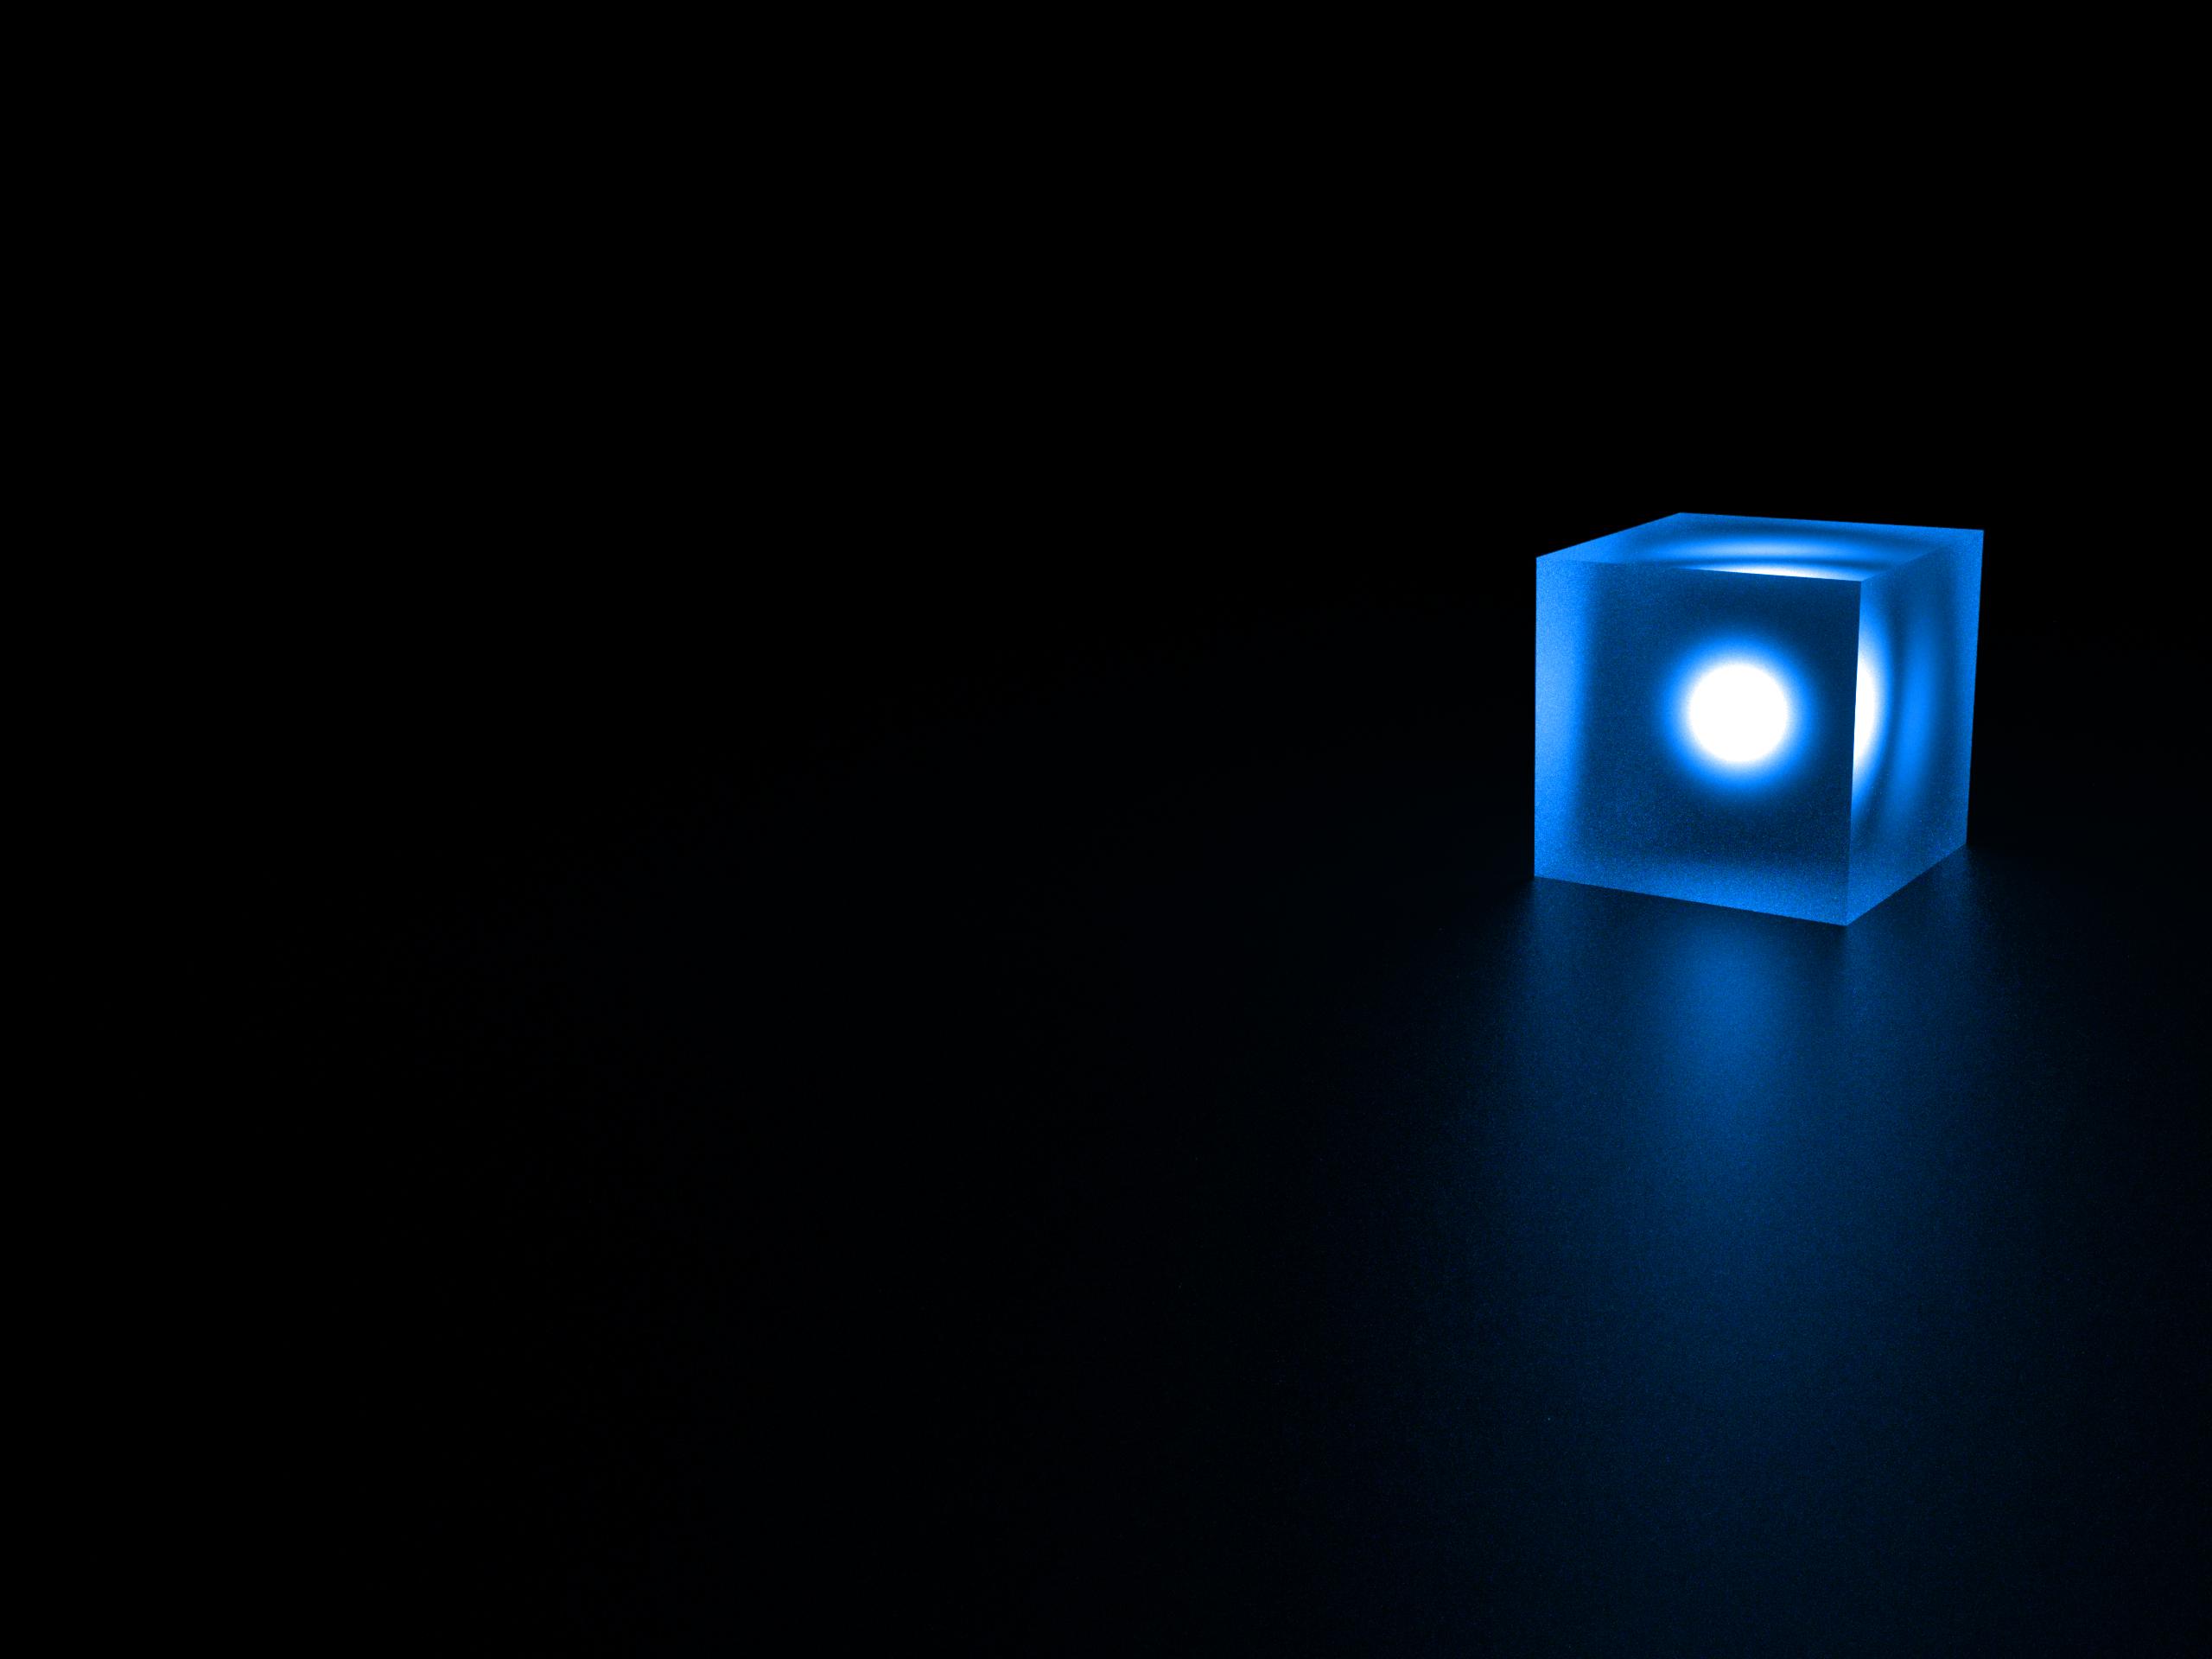 Blue Cube Wallpaper 2560x1920 Blue Cube Glossy Shine 3D Render 2560x1920